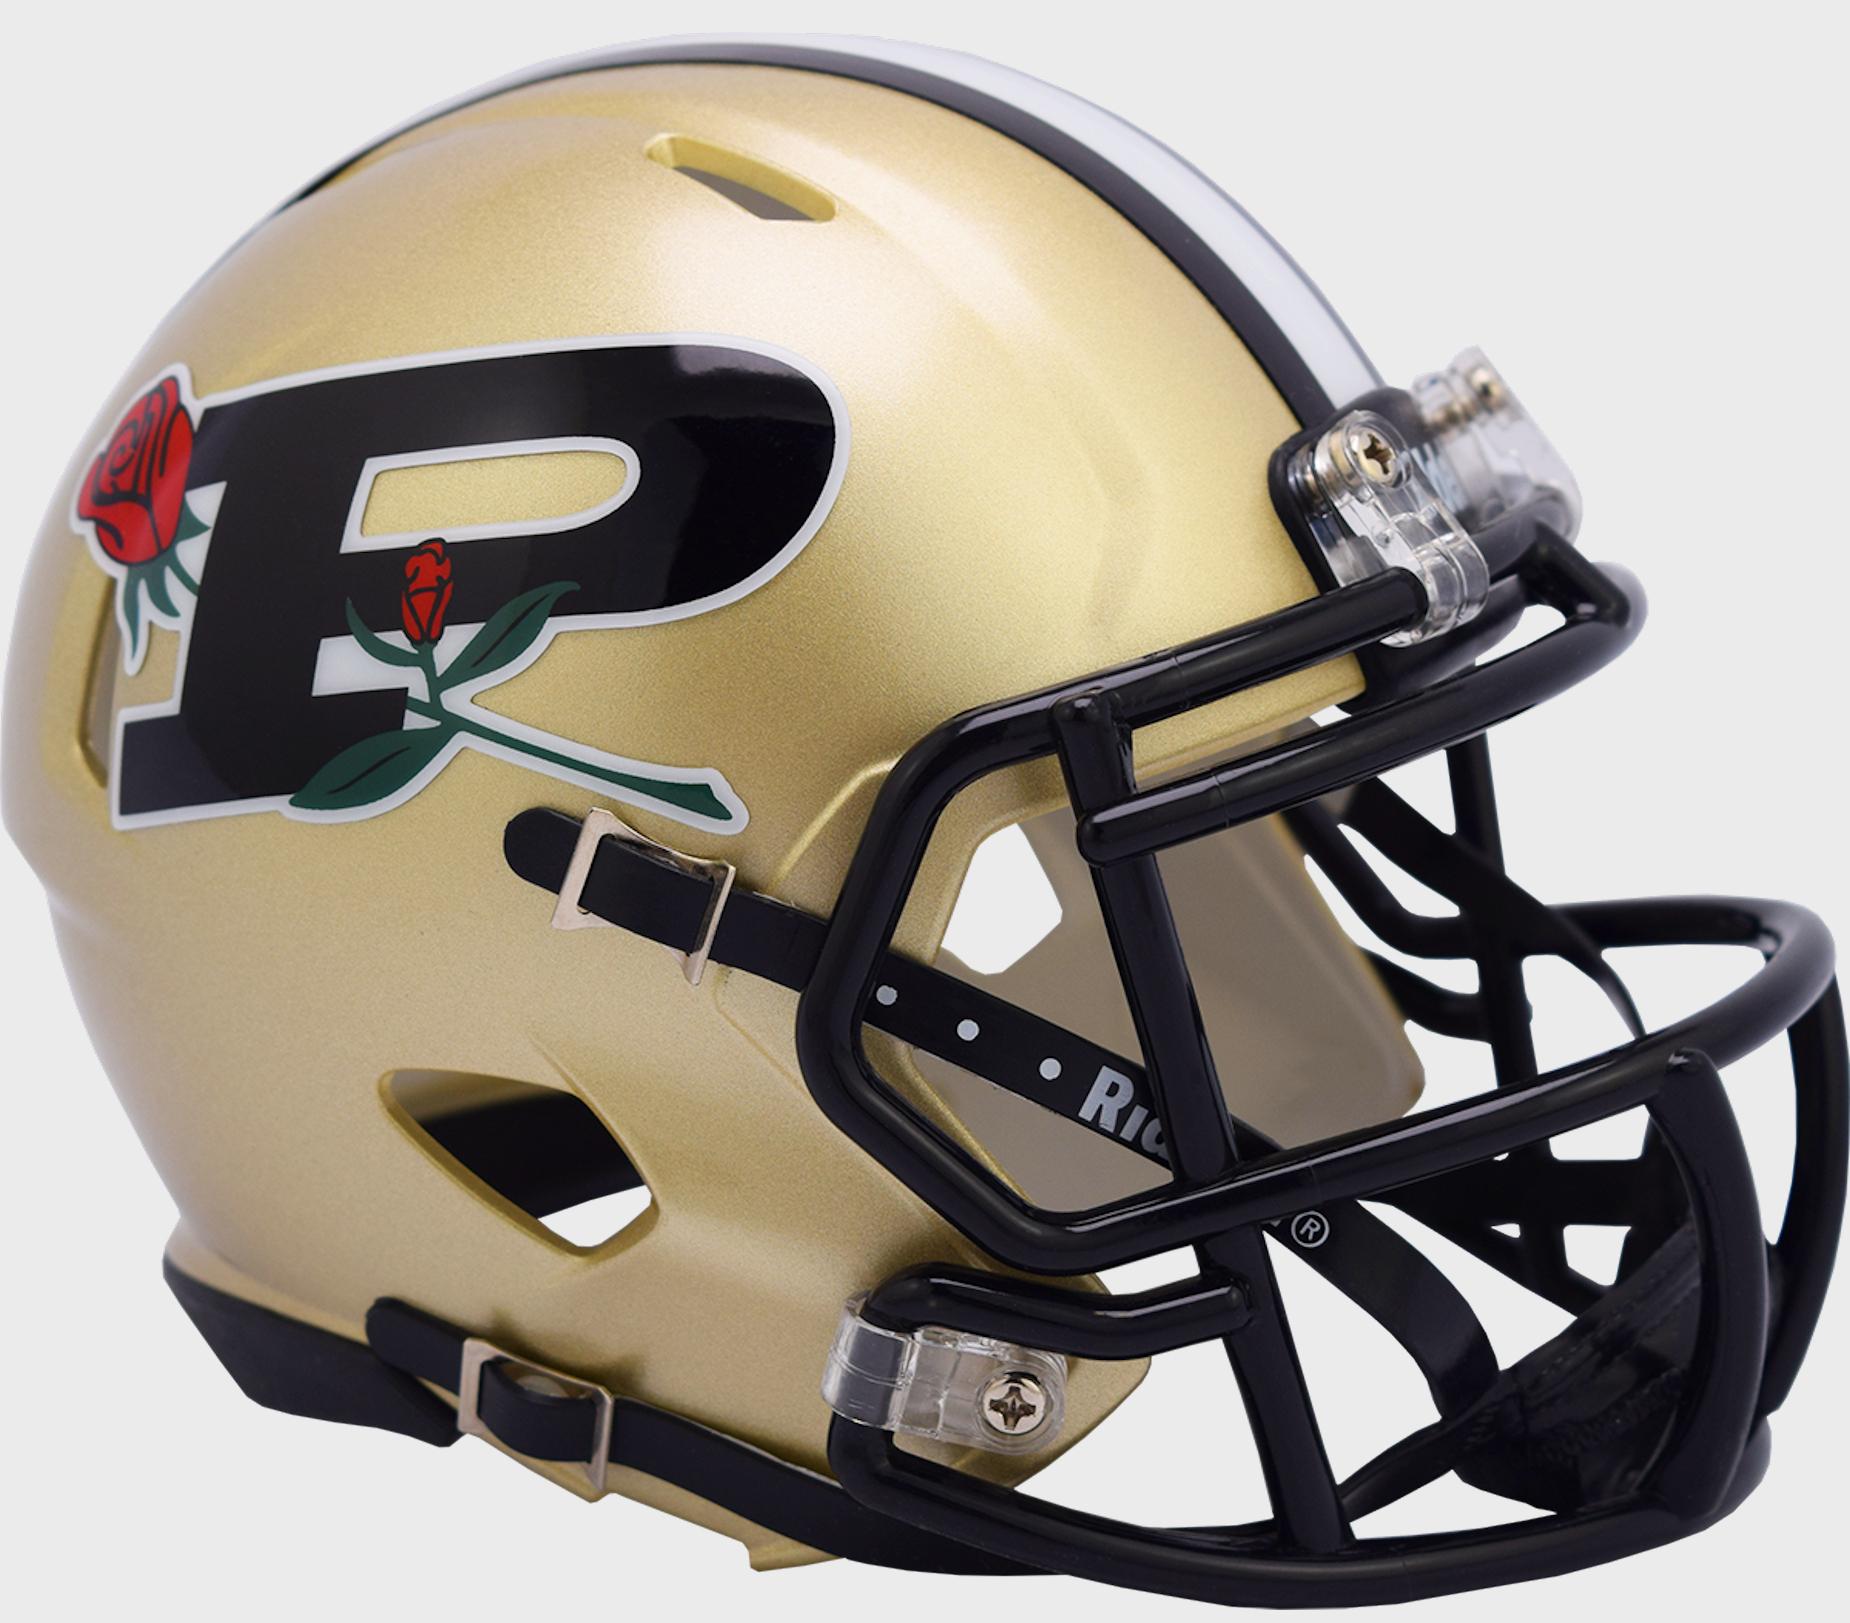 Purdue Boilermakers NCAA Mini Speed Football Helmet <B>20th anniv Rose Bowl</B>